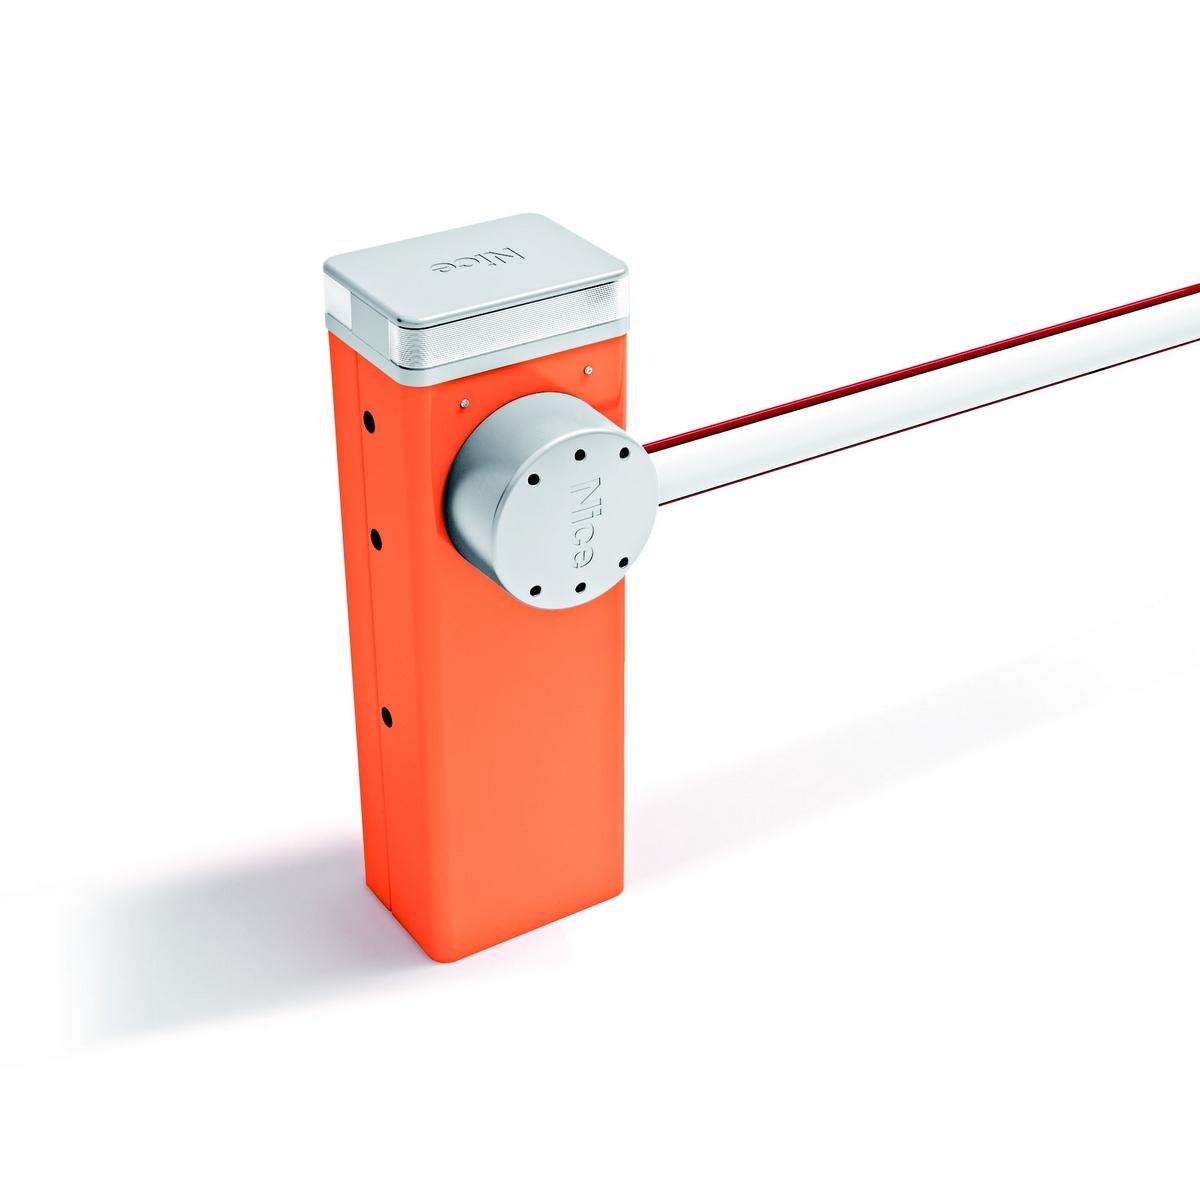 Apollo ns signo barrier arm gate operator